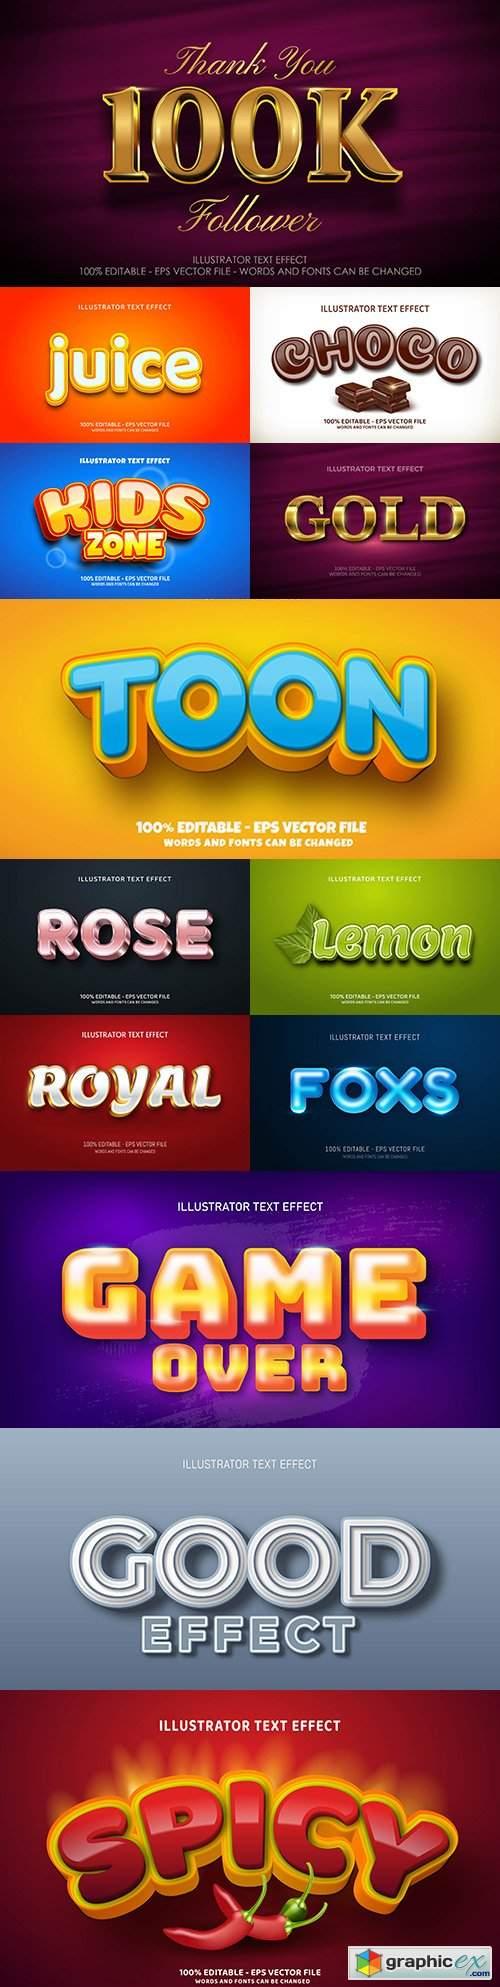 Editable font effect text collection illustration design 159